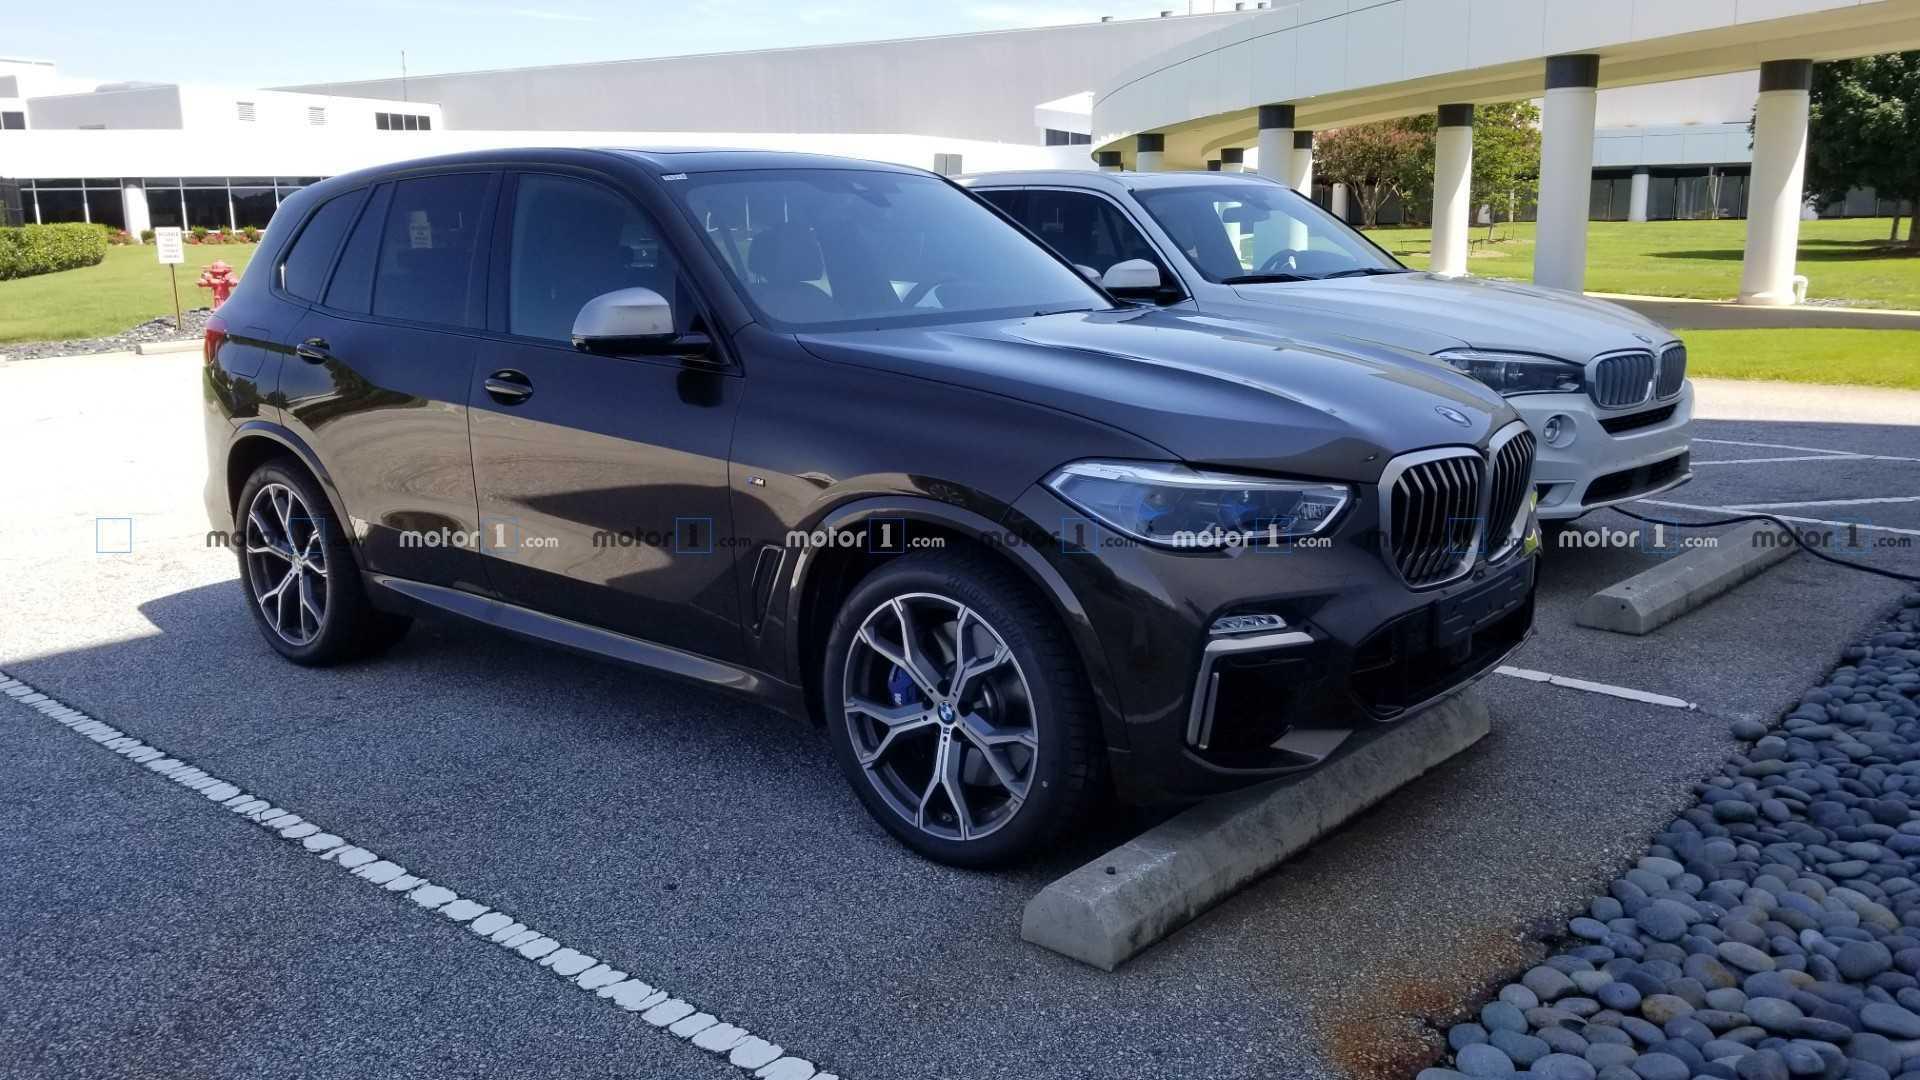 2019 Bmw X5 M50i Caught By Motor1 Com Reader